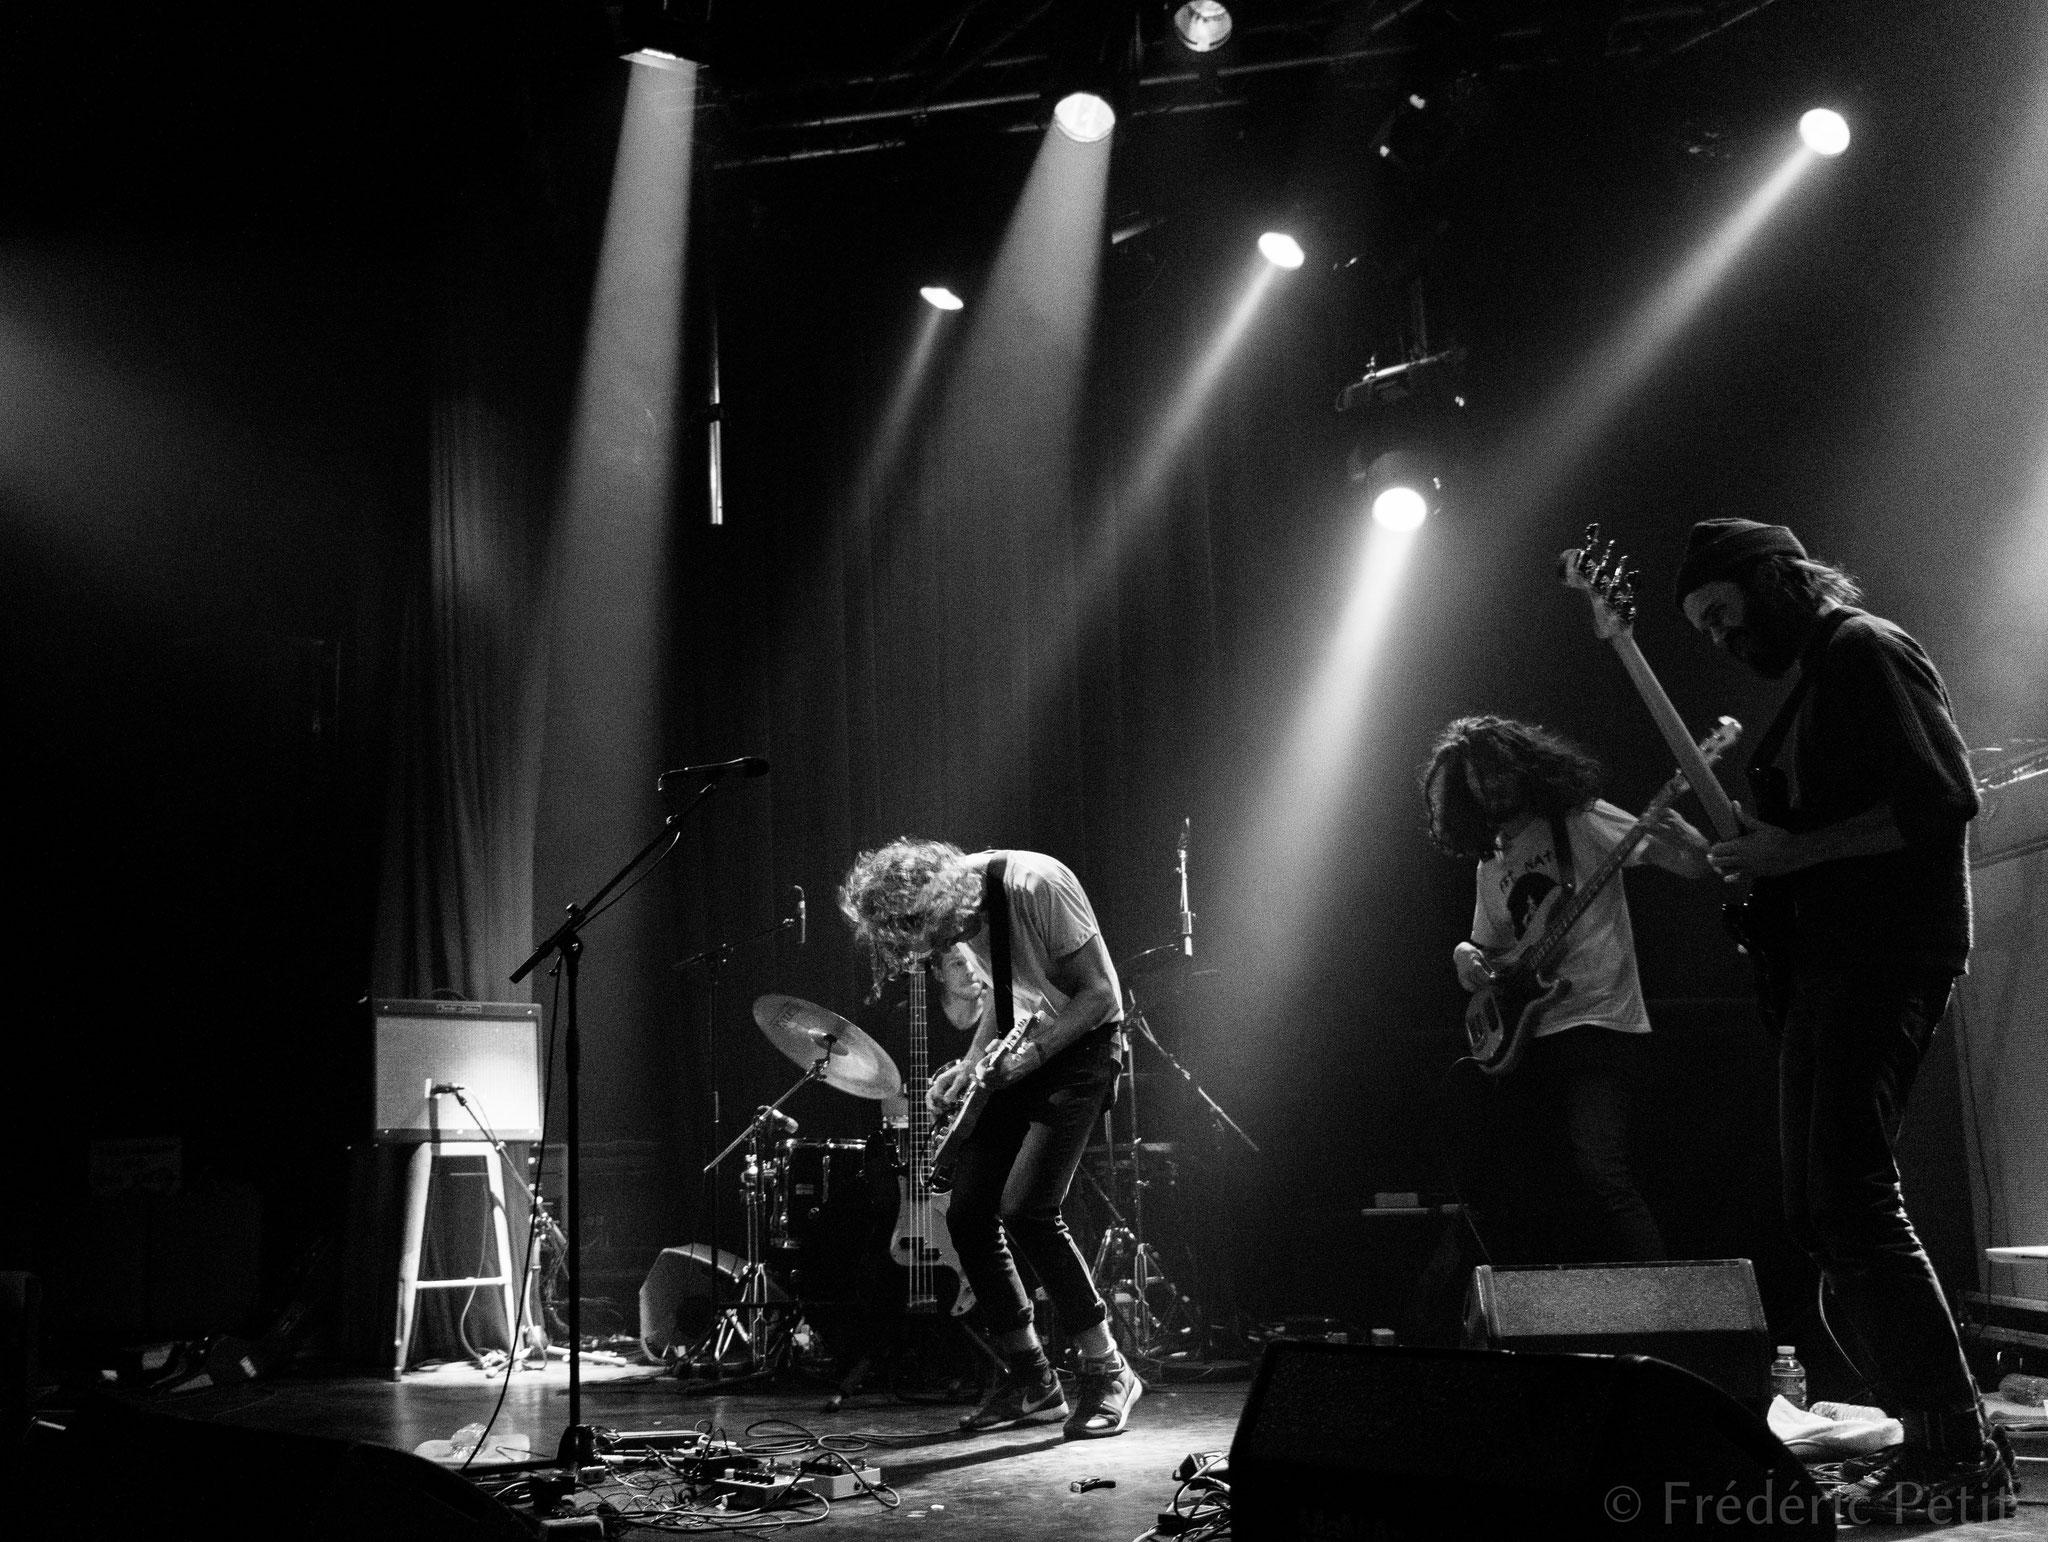 12 octobre 2016 - Jesse Mac Cormack @ 3 Baudets (MaMA Festival)